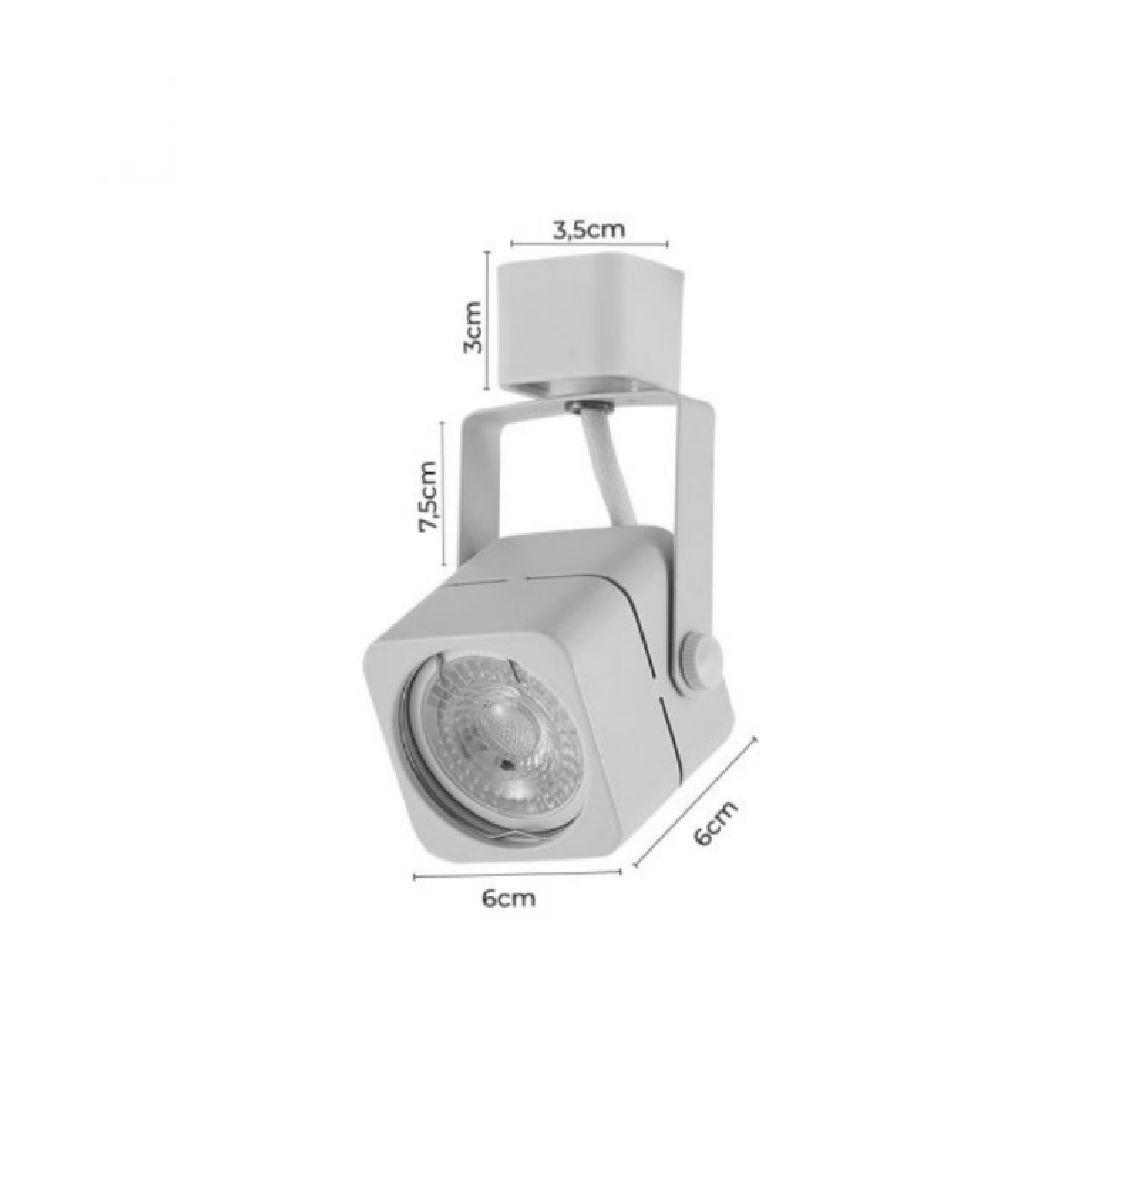 Kit Trilho Eletrificado 1,5m Branco Nordecor + 4 Spot Quad MR16 / GU10 + Lâmp. Led Luz Quente